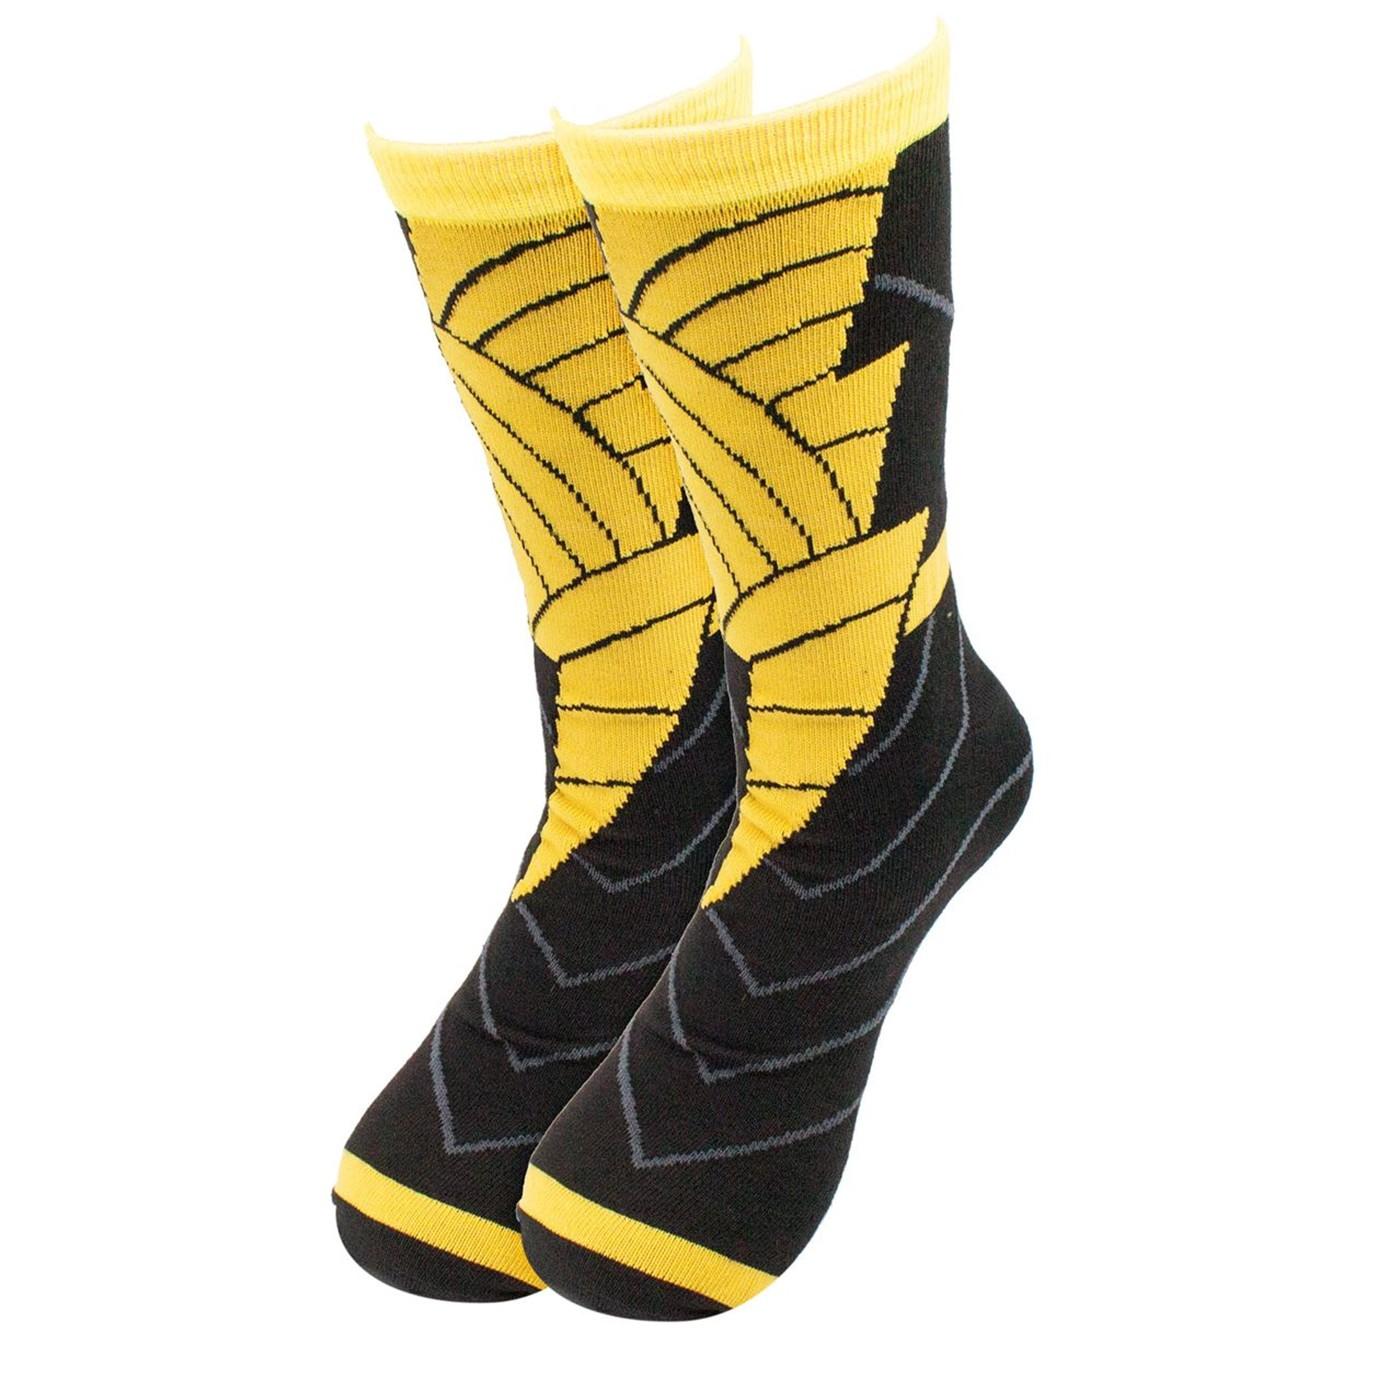 Black Adam Costume Crew Socks